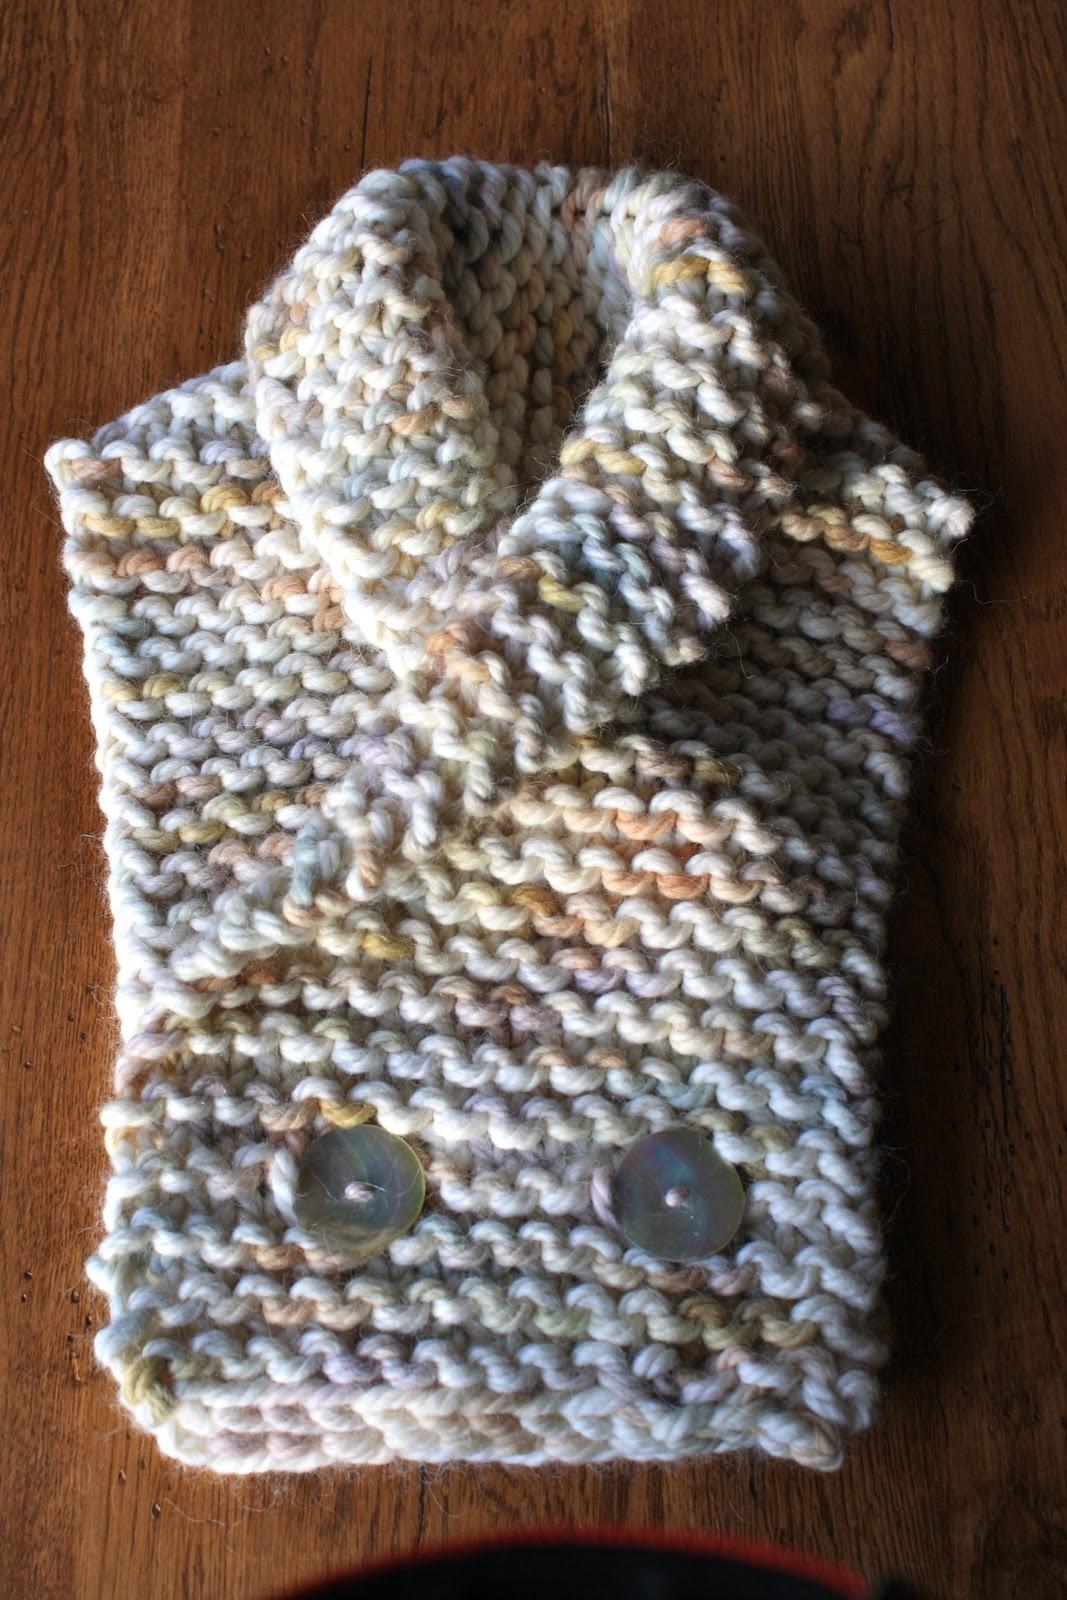 Cora Cooks: Knitting